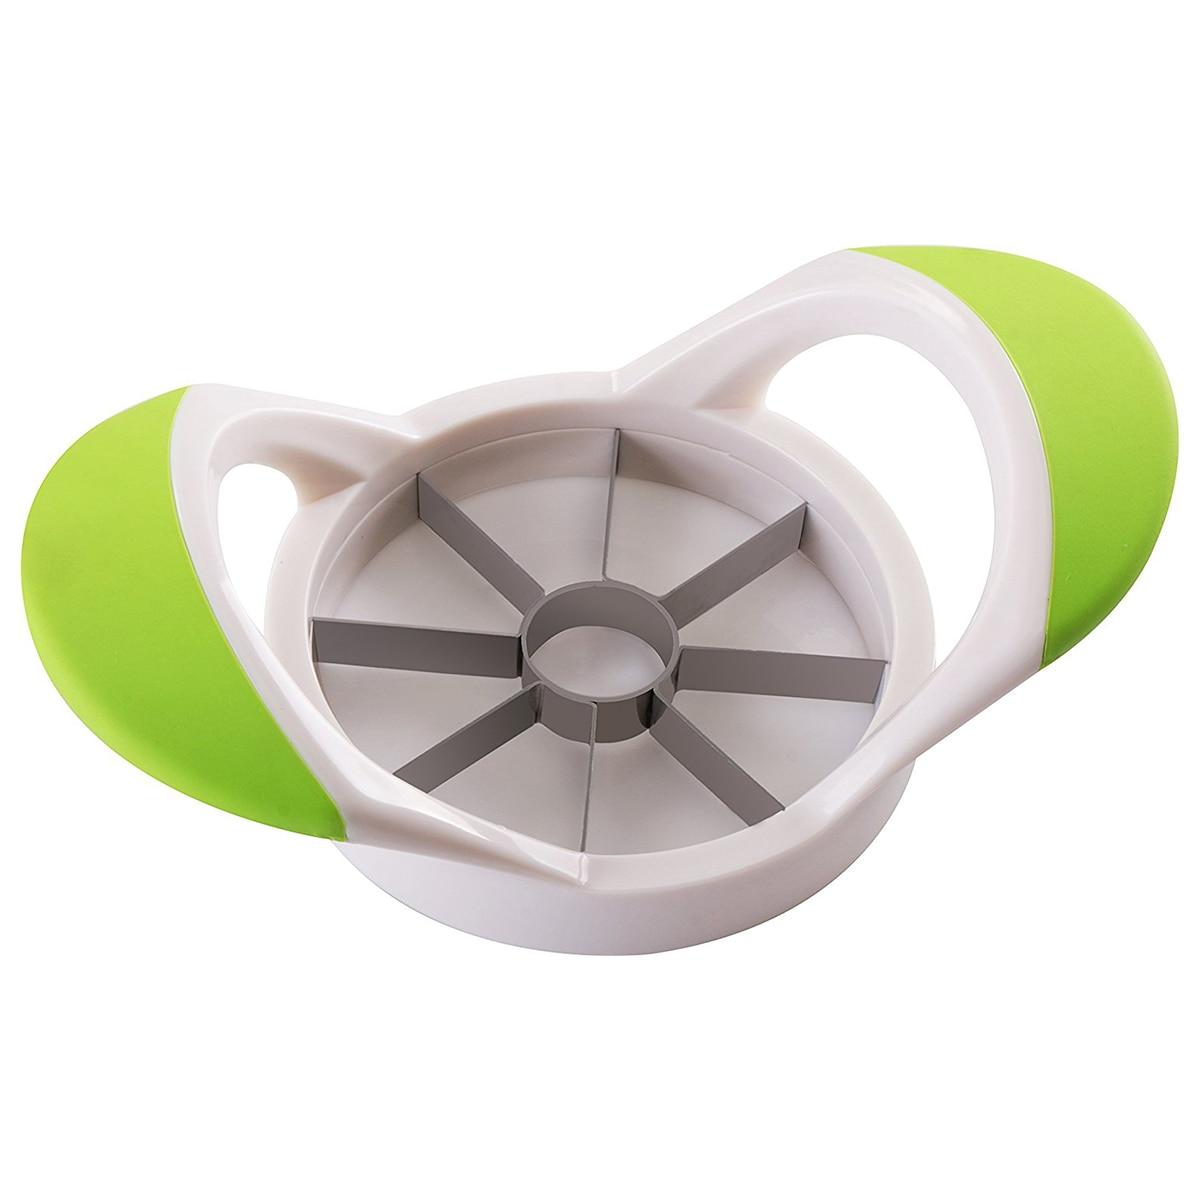 Mela Affettatrice-Corer-Divider-Cutter-In Acciaio Inox-100% Resistente Alla RuggineMela Affettatrice-Corer-Divider-Cutter-In Acciaio Inox-100% Resistente Alla Ruggine